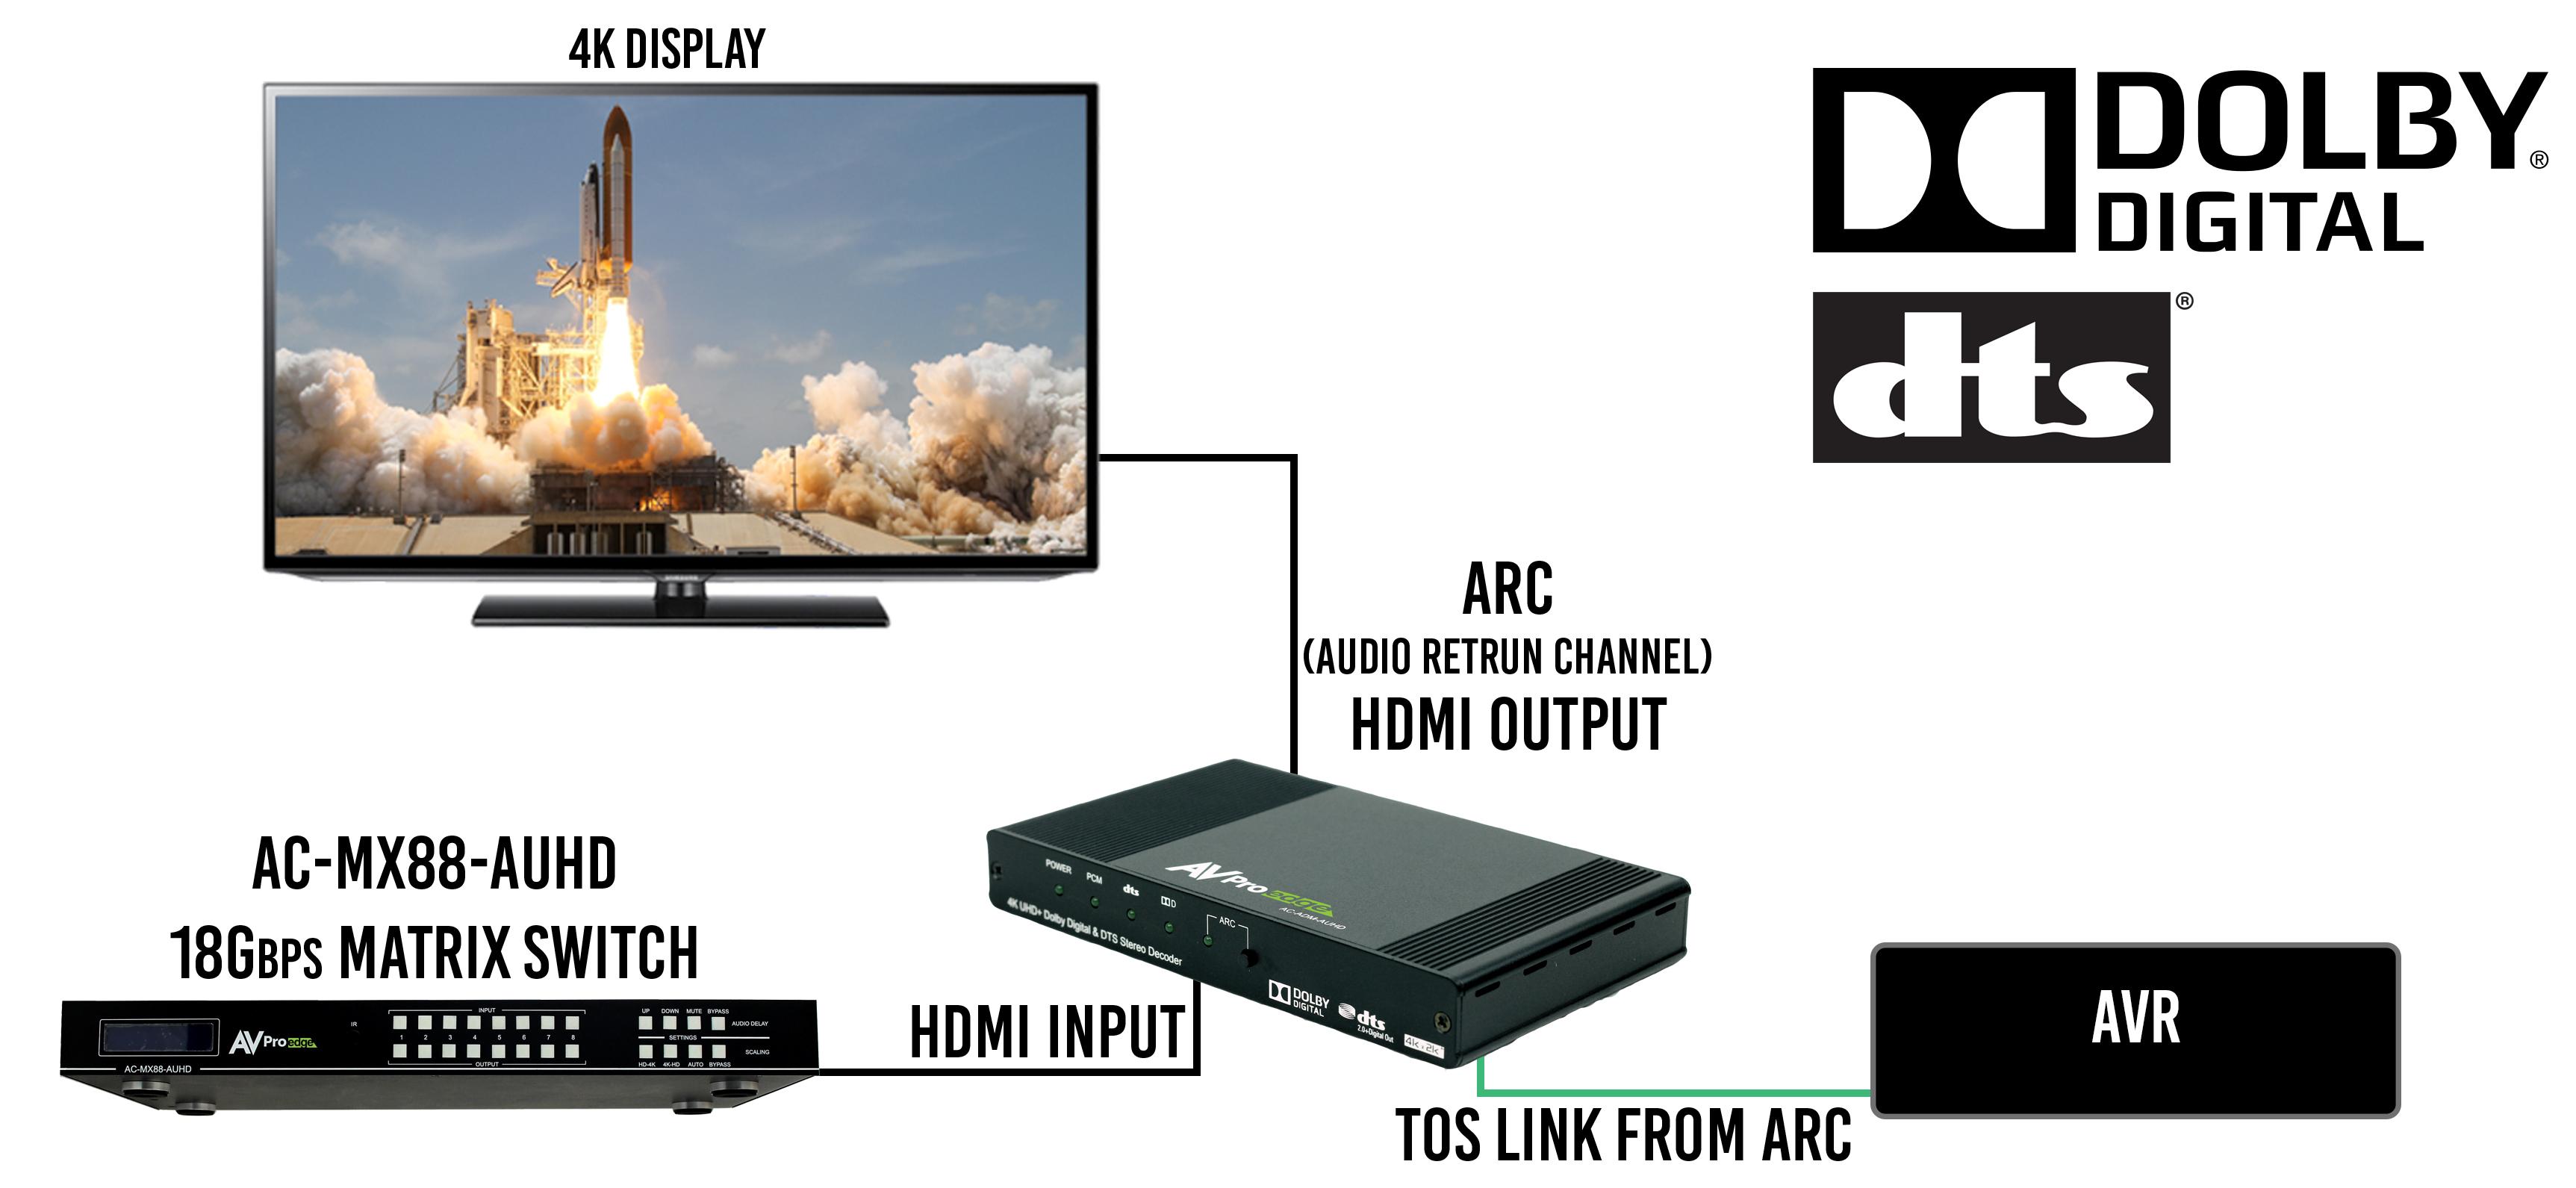 4k Uhd Dolby Digital Dts Stereo Decoder Hdmi Arc Wiring Diagram Diagrams